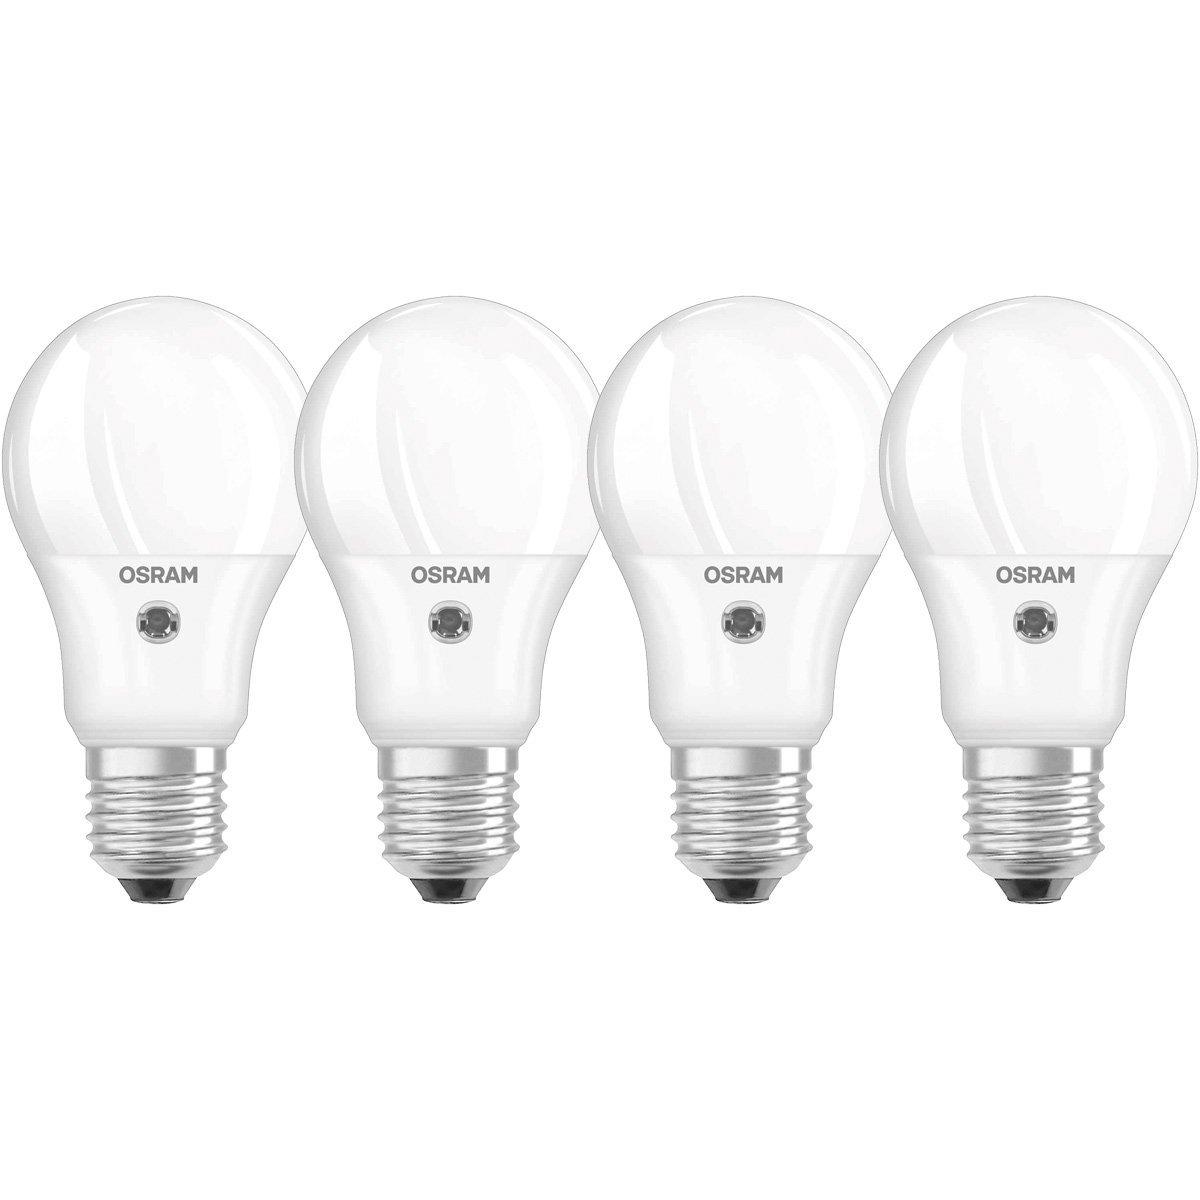 Osram LED Lampe 4er Pack E27 amazon